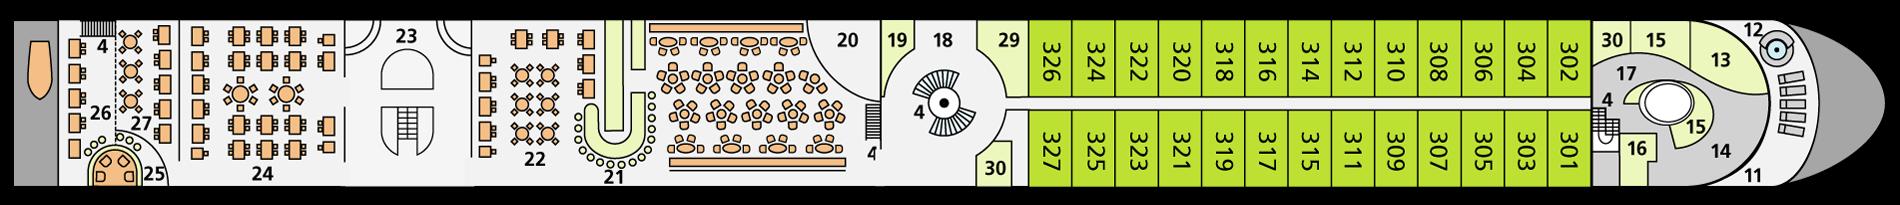 A-ROSA BRAVA Deck 3